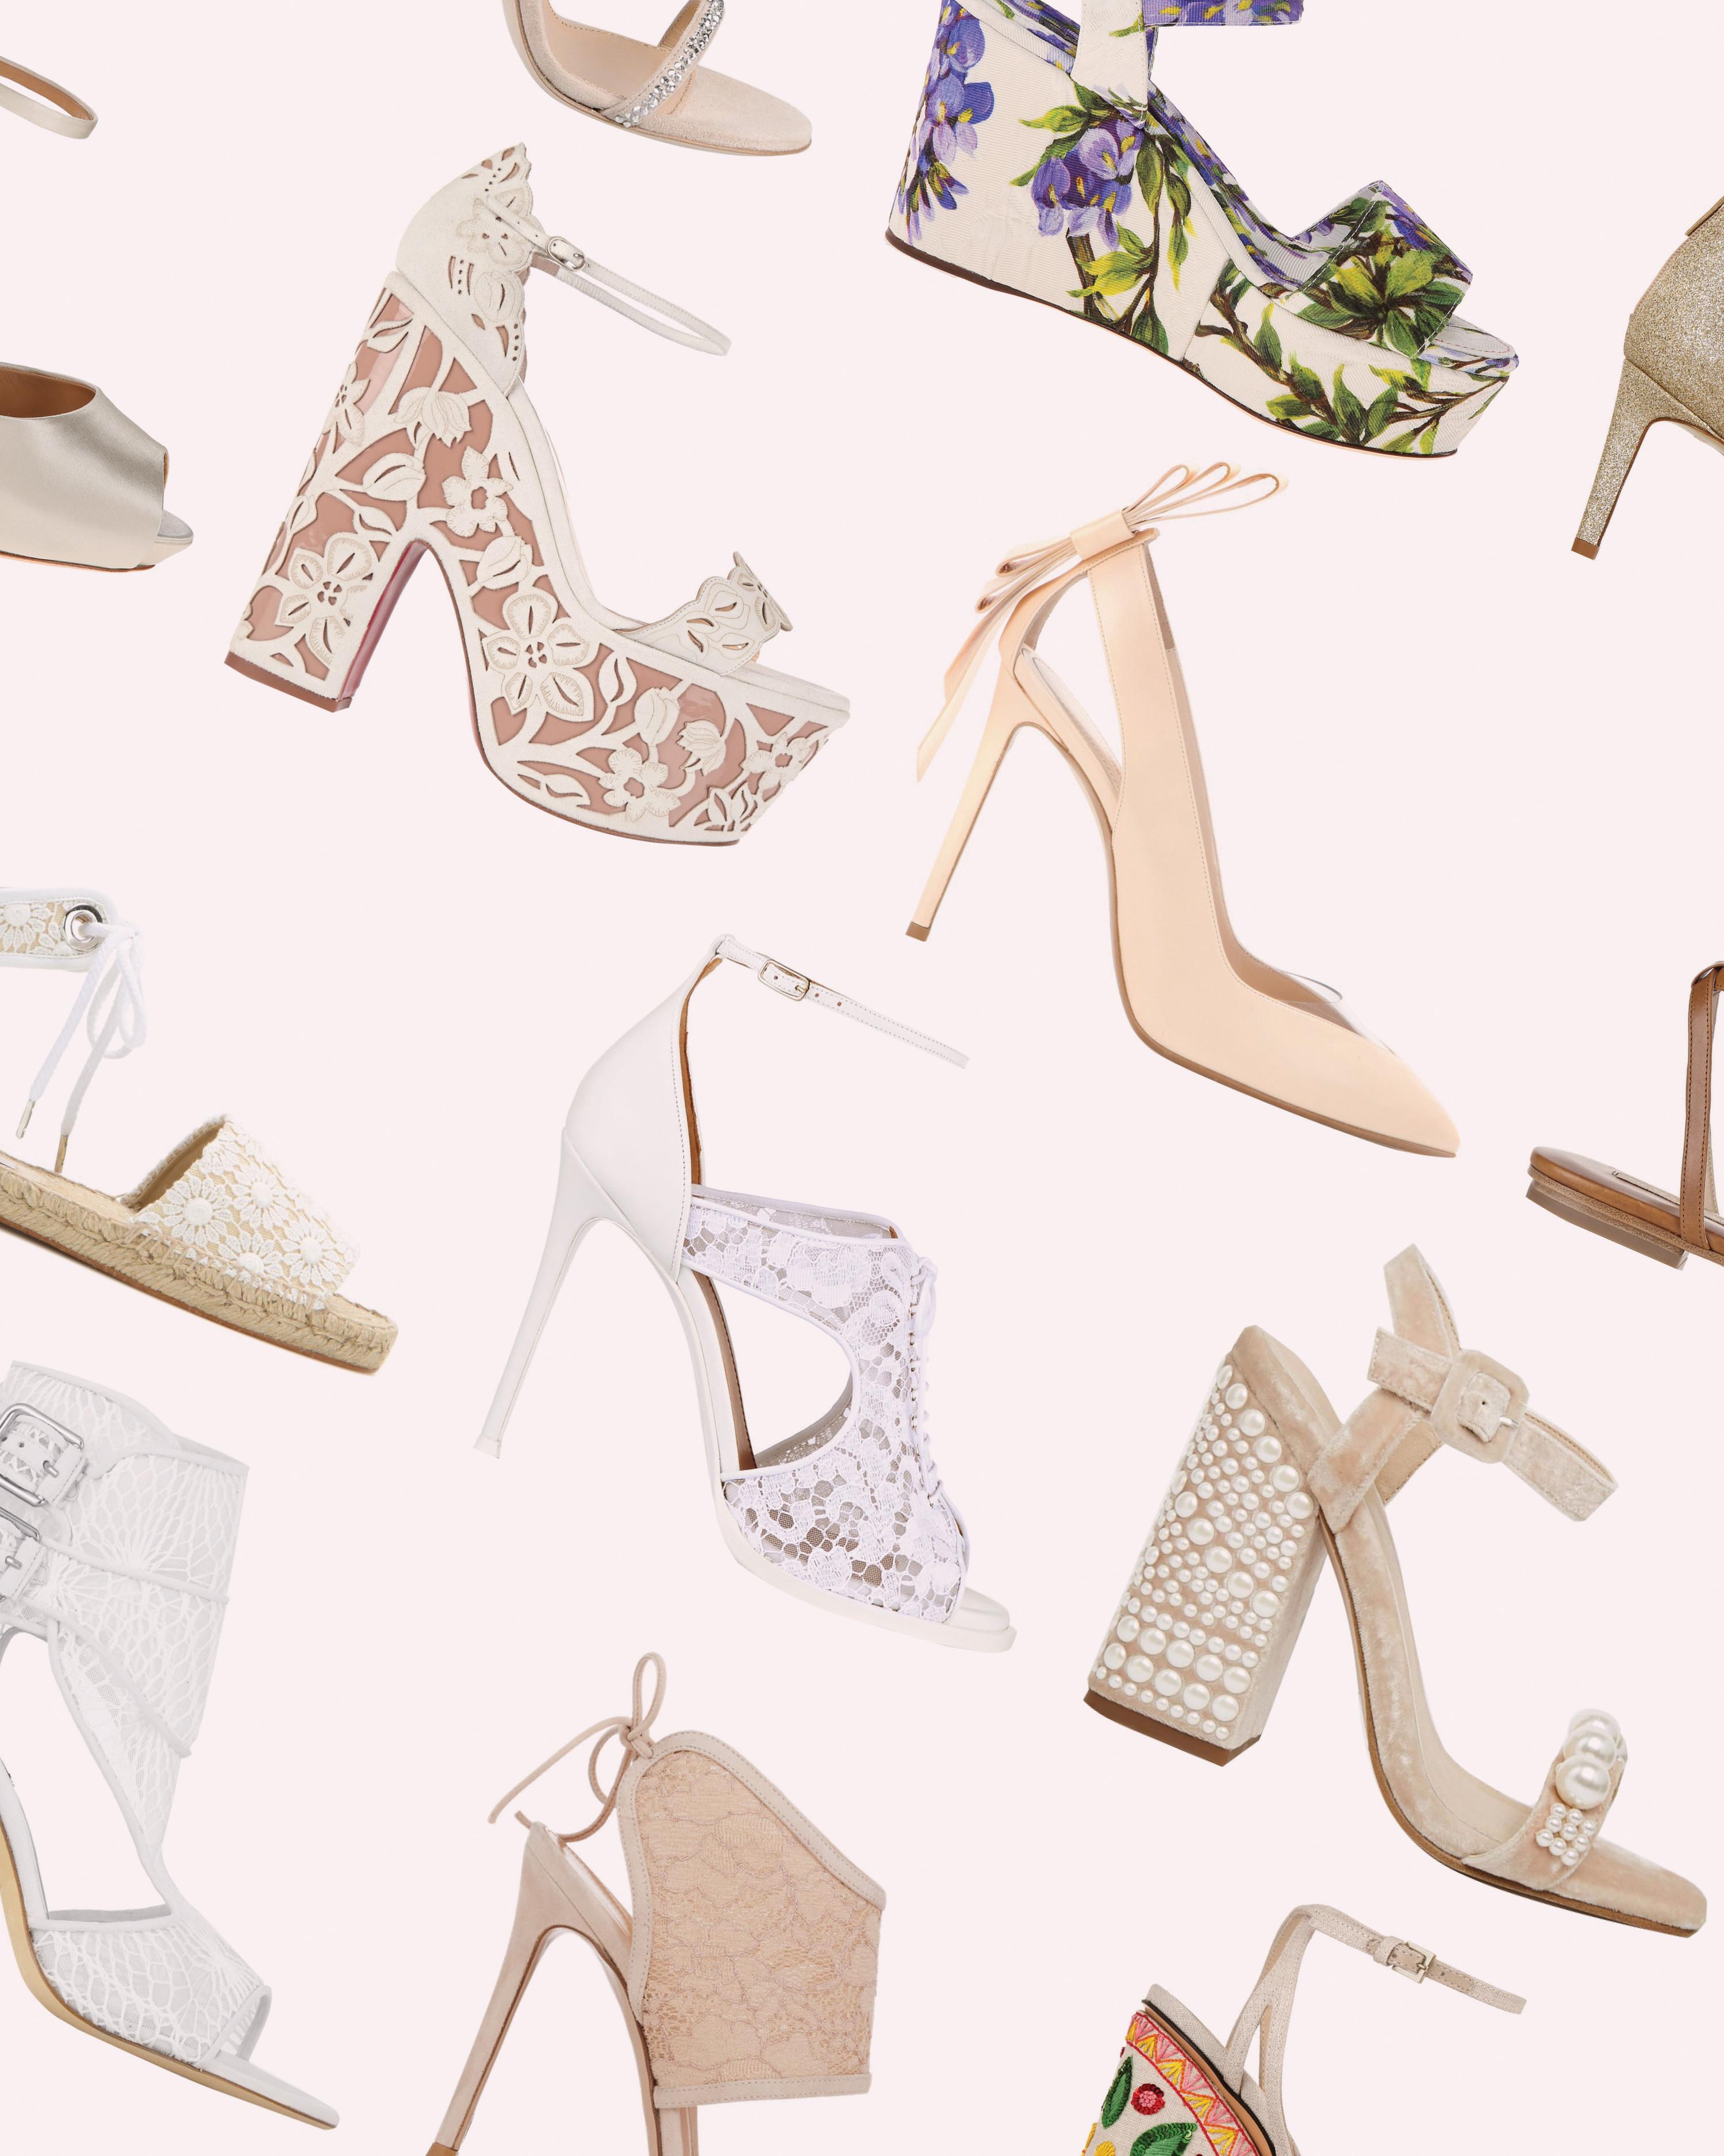 639180744d923 50 Best Shoes for a Bride to Wear to a Summer Wedding | Martha Stewart  Weddings